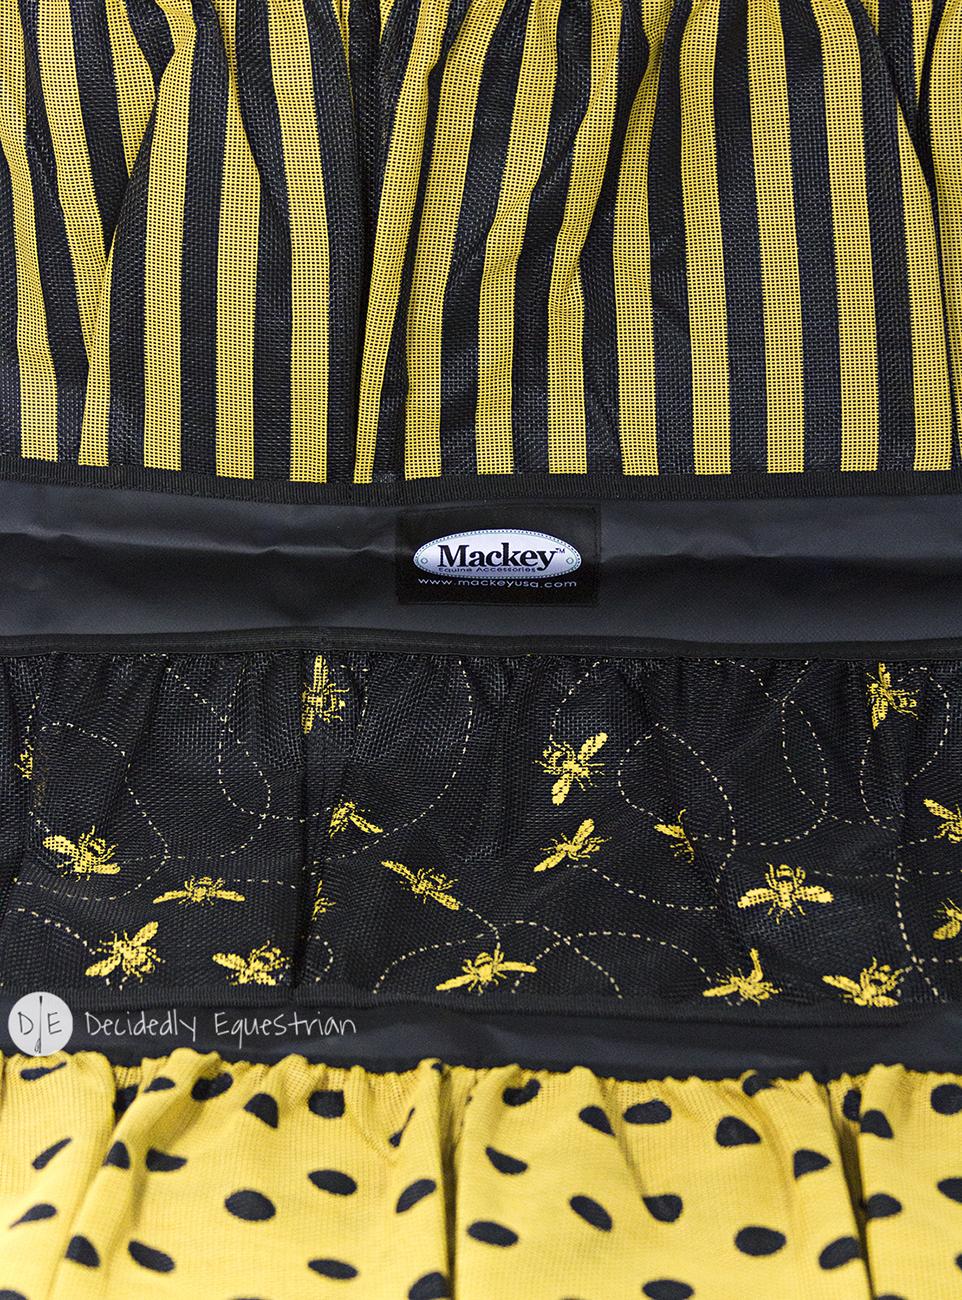 Mackey USA Bee Mine Hanging Tack Organizer Review